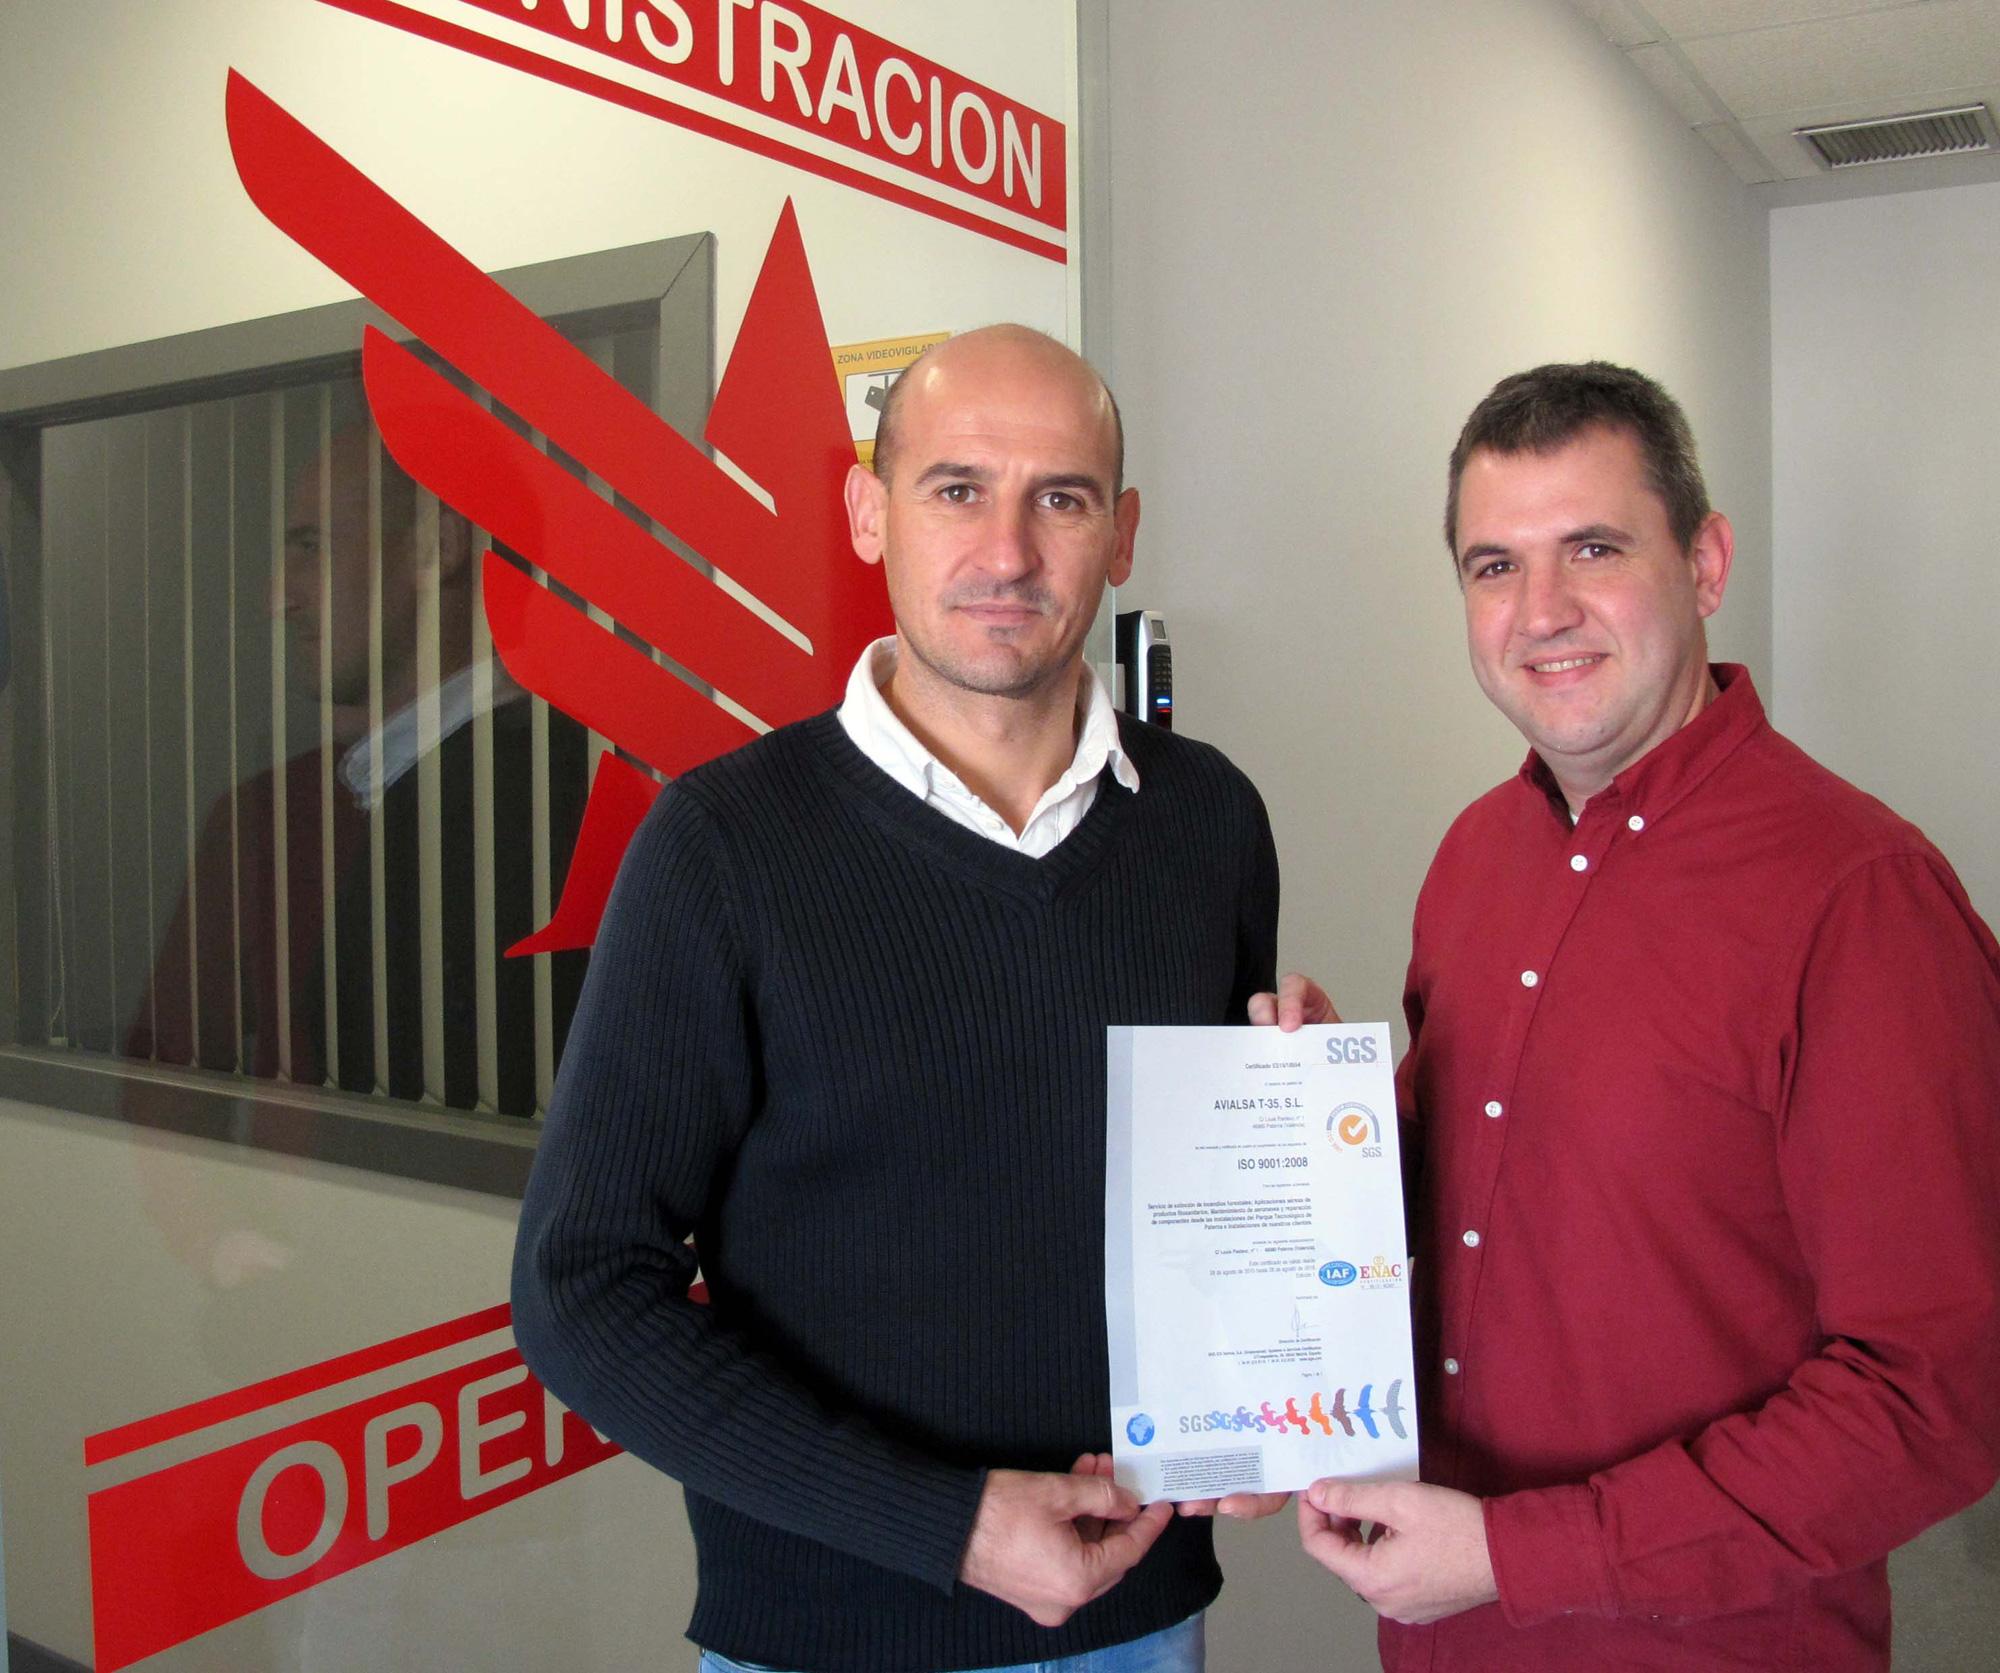 Avialsa se certifica en la ISO 9001:2008